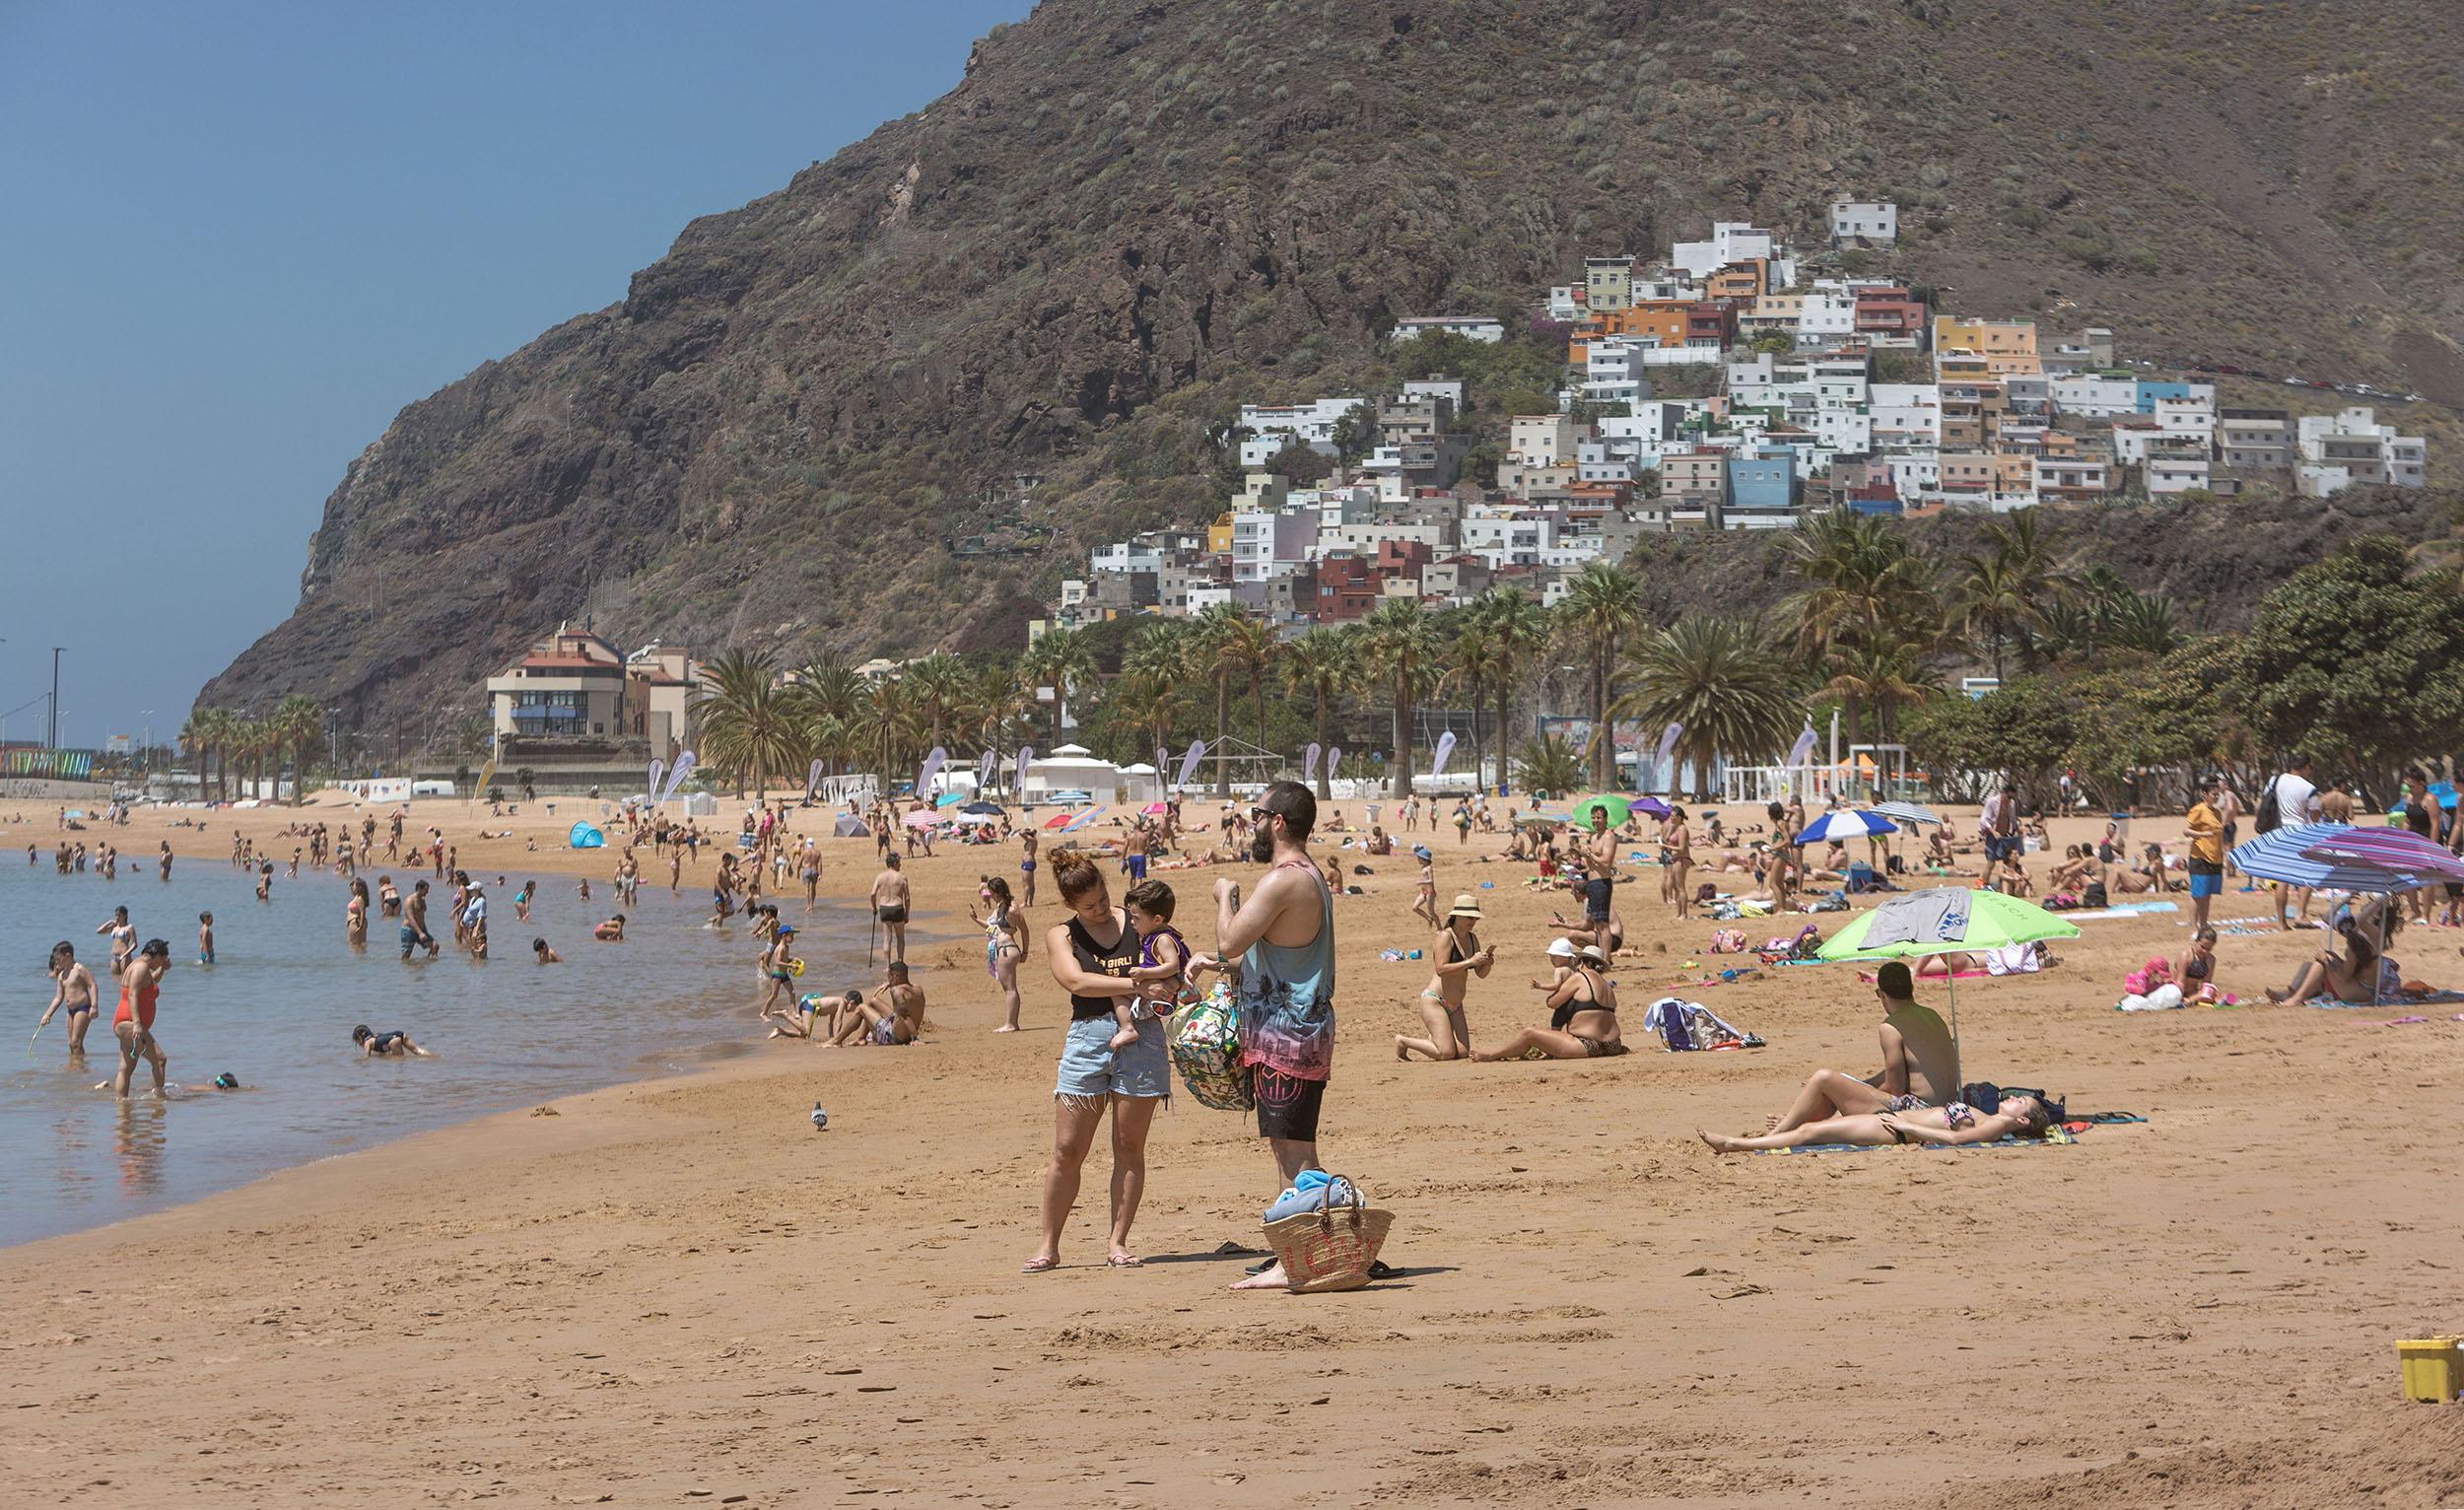 People sunbathe on Las Teresitas beach in the Spanish Canary Island of Tenerife, on Sunday, May 25.